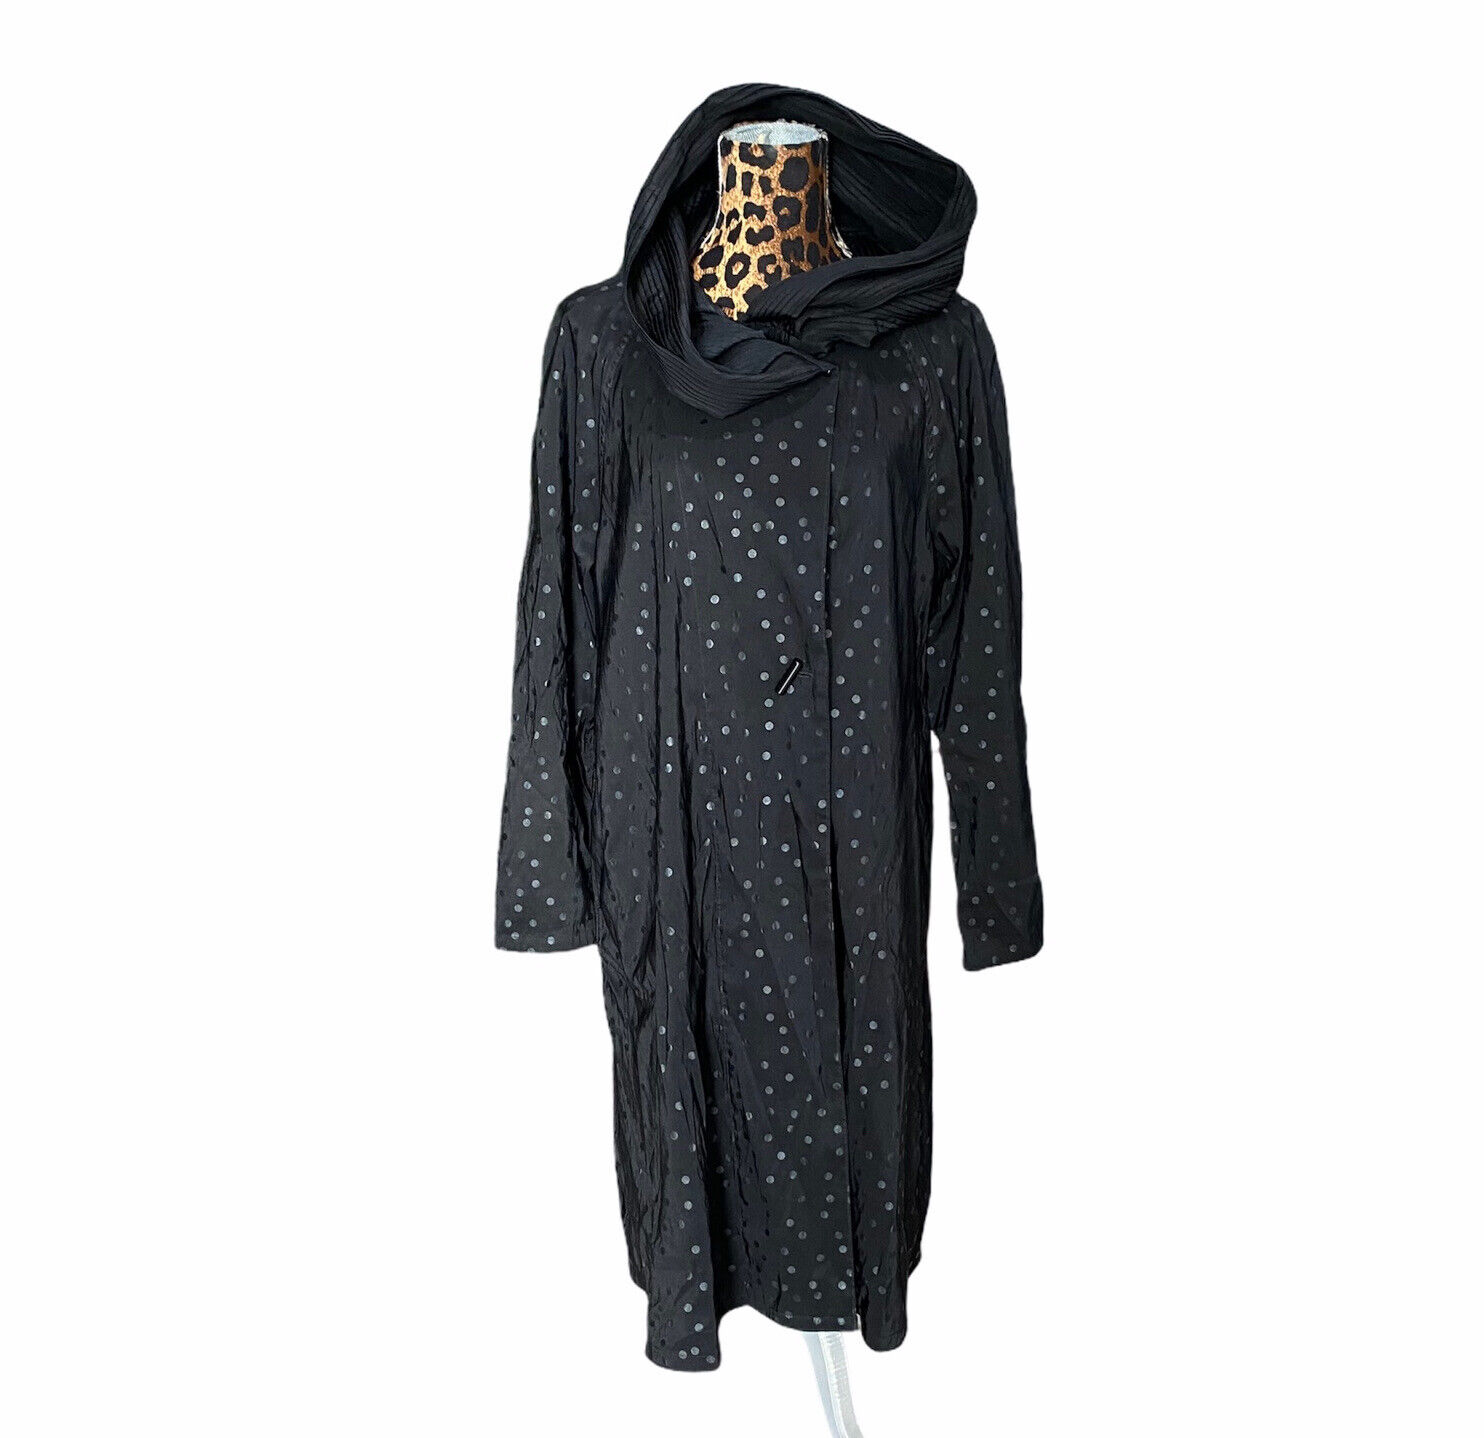 Mycra Pac Long Donatella Raincoat Black Dot Reversible Pleated Hood Sz O-P 2